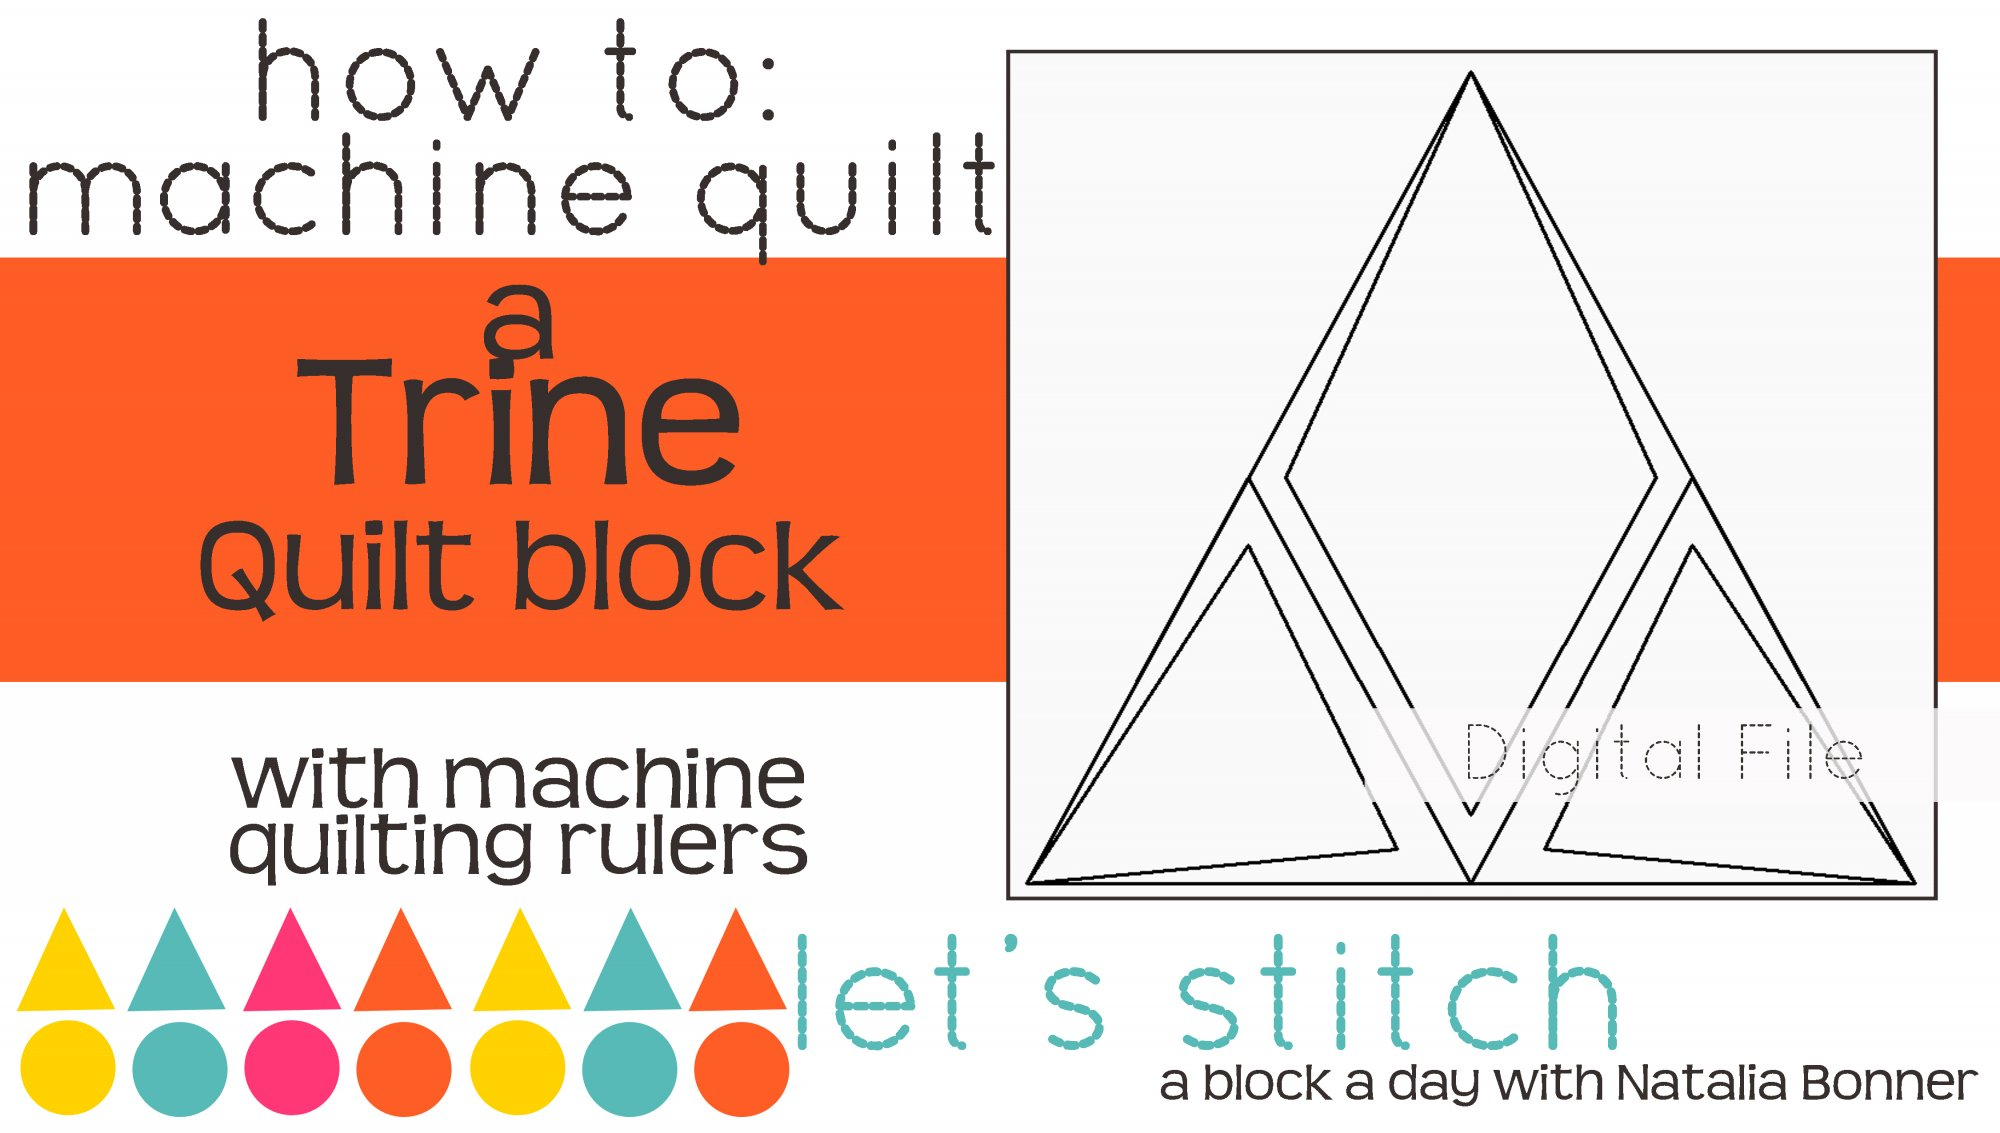 Trine 6 Block - Digital